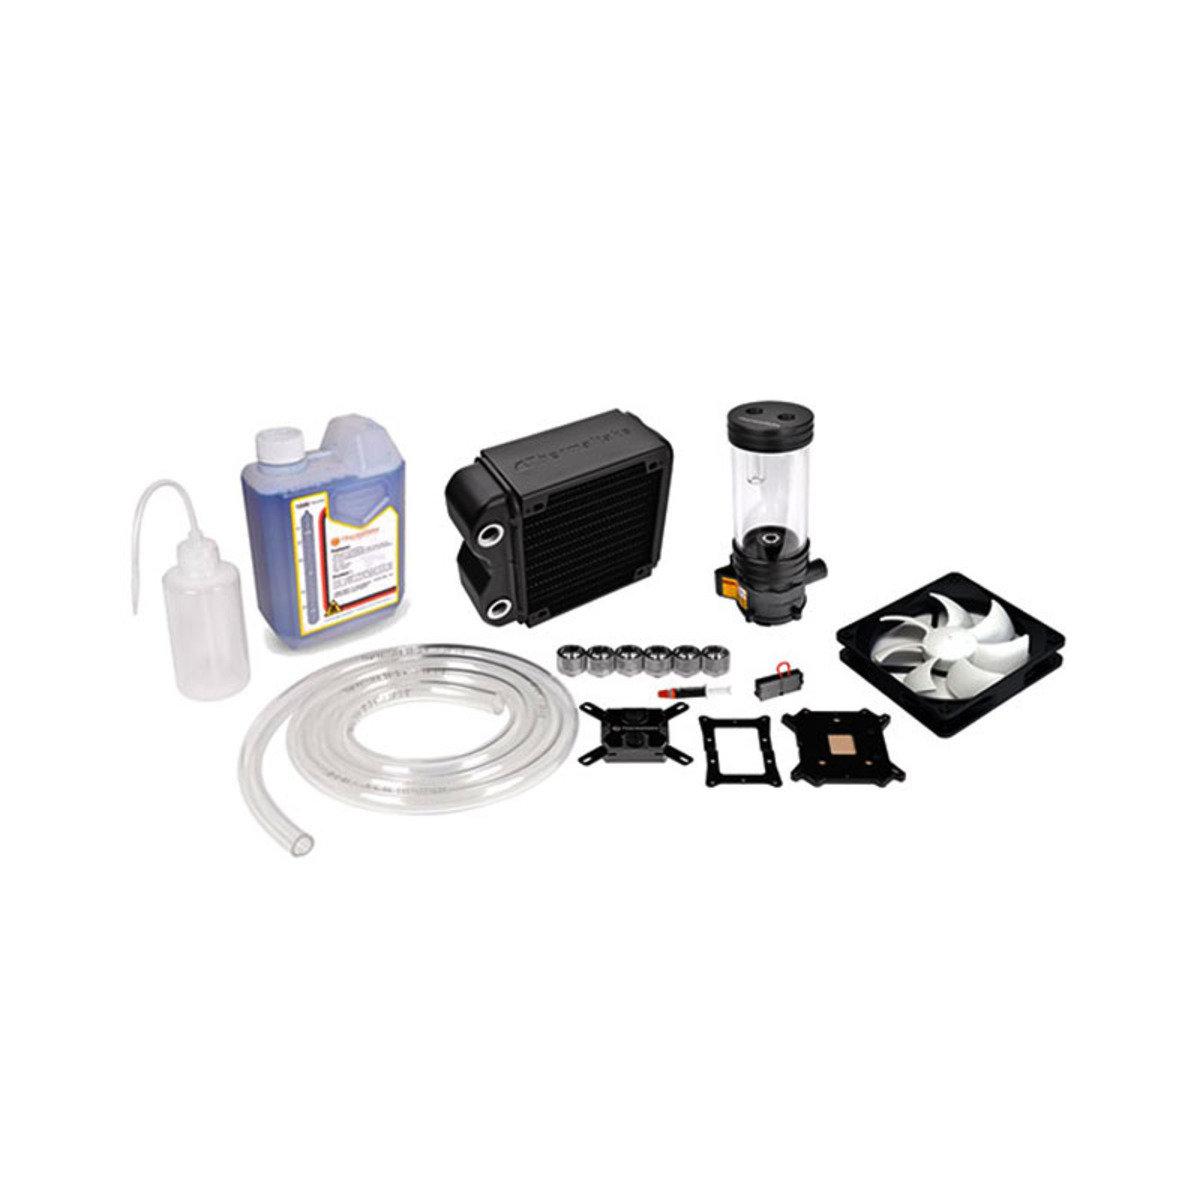 DIY玩家級 中央處理器 120mm液冷散熱器 Pacific RL120 Water CPU Cooling Kit